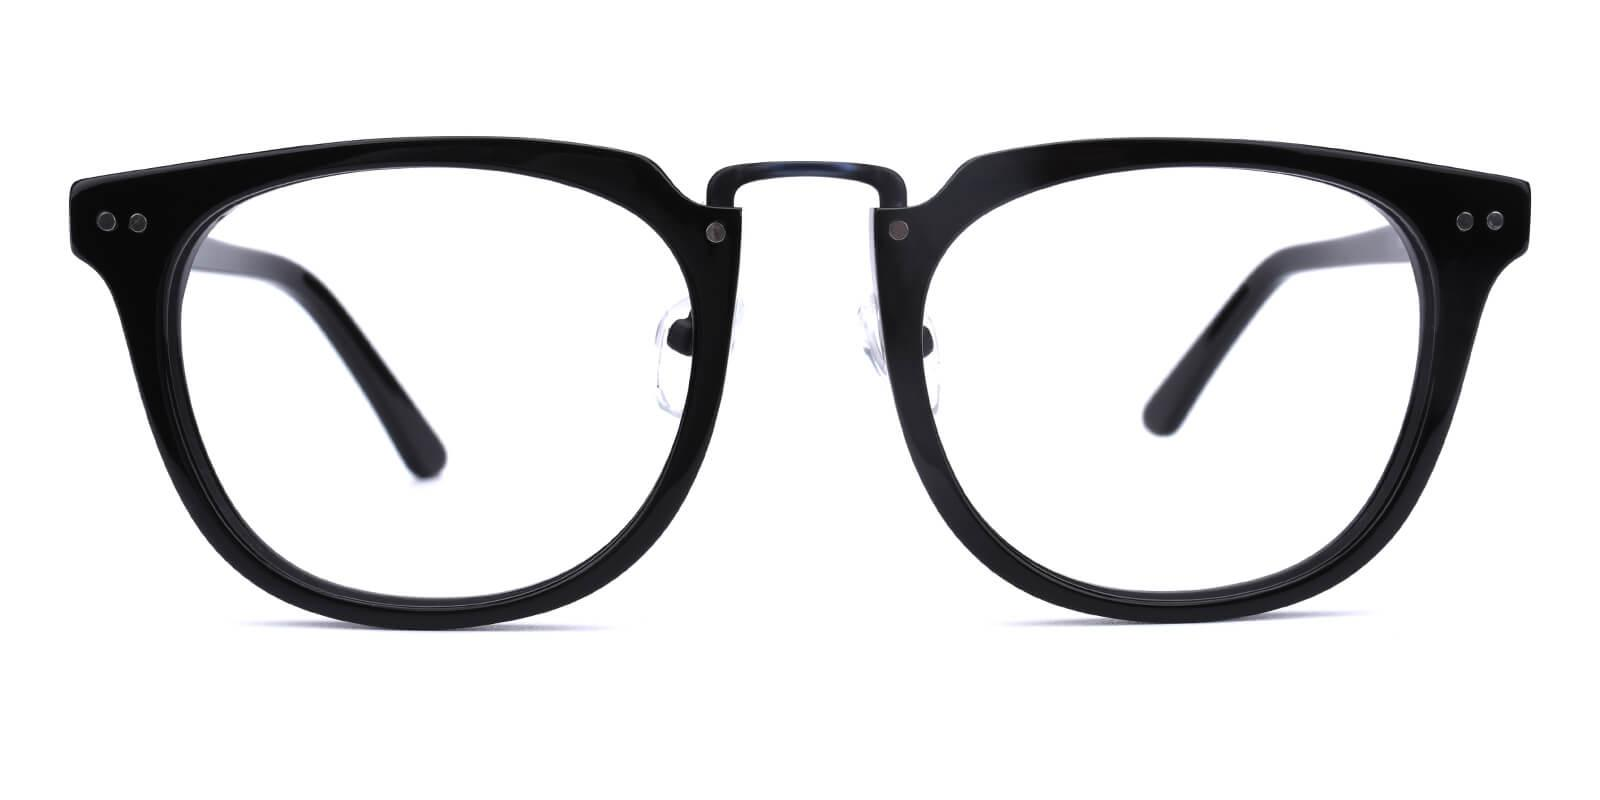 Crave-Black-Square-Acetate-Eyeglasses-detail